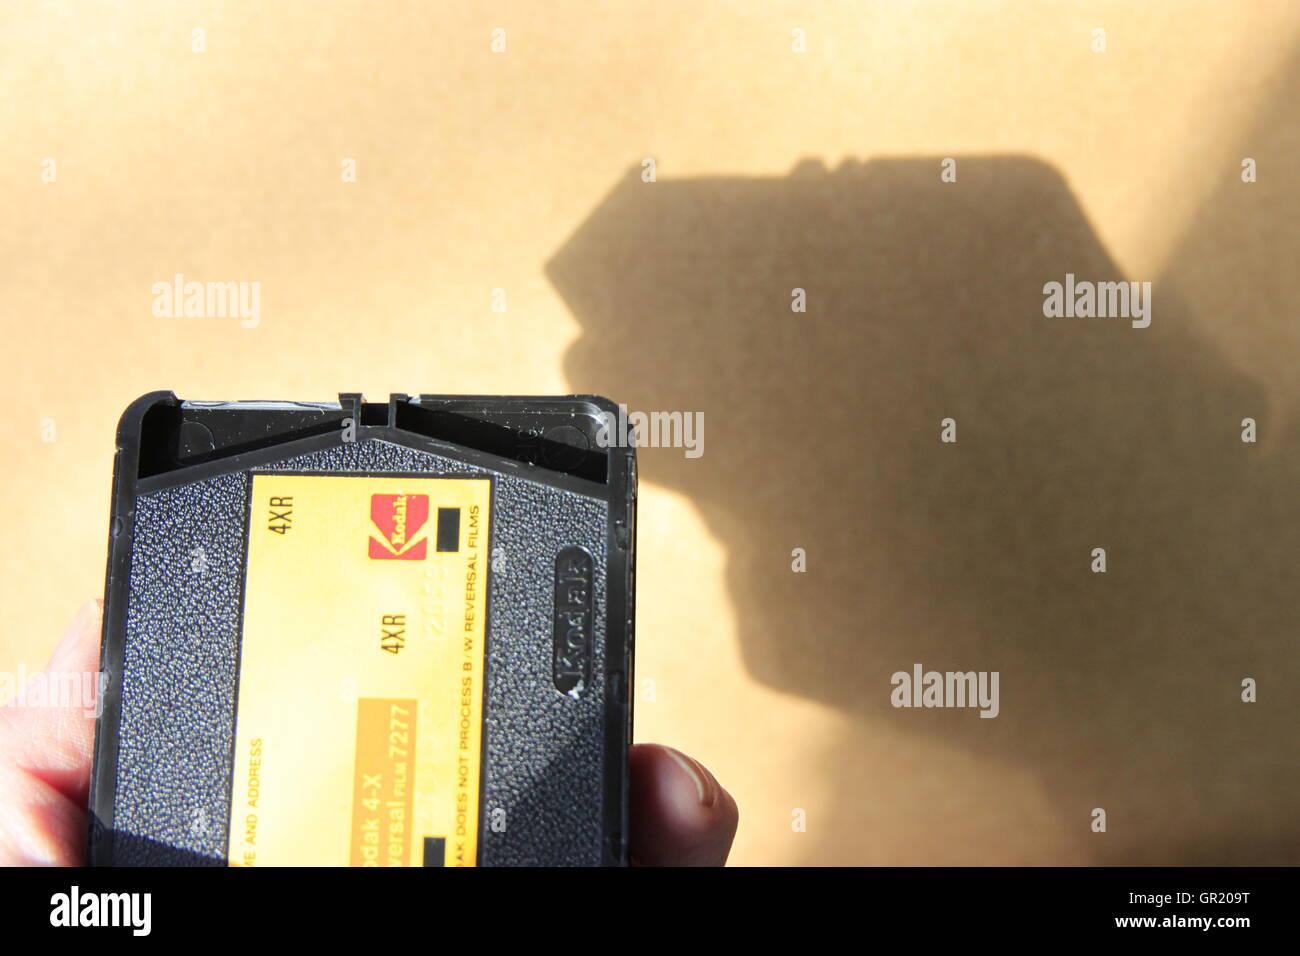 Retro seventies Super 8 analogue/analog cine camera movie film cartridge with shadow on wall. - Stock Image